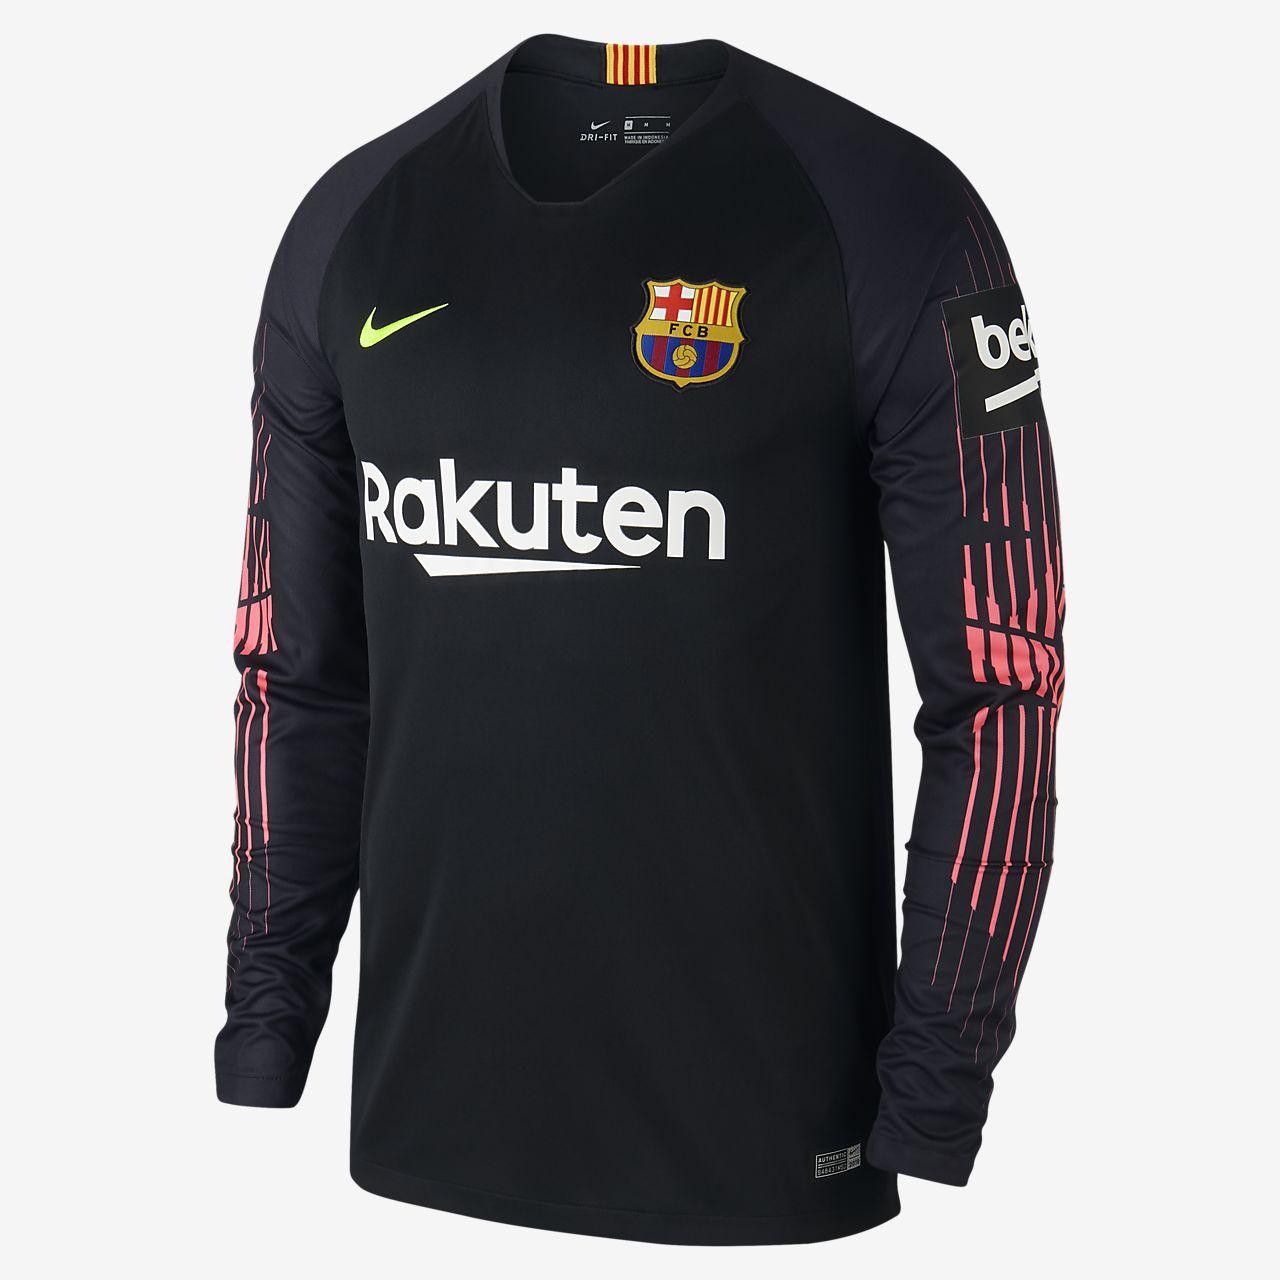 2018/19 FC Barcelona Stadium Goalkeeper Erkek Futbol Forması